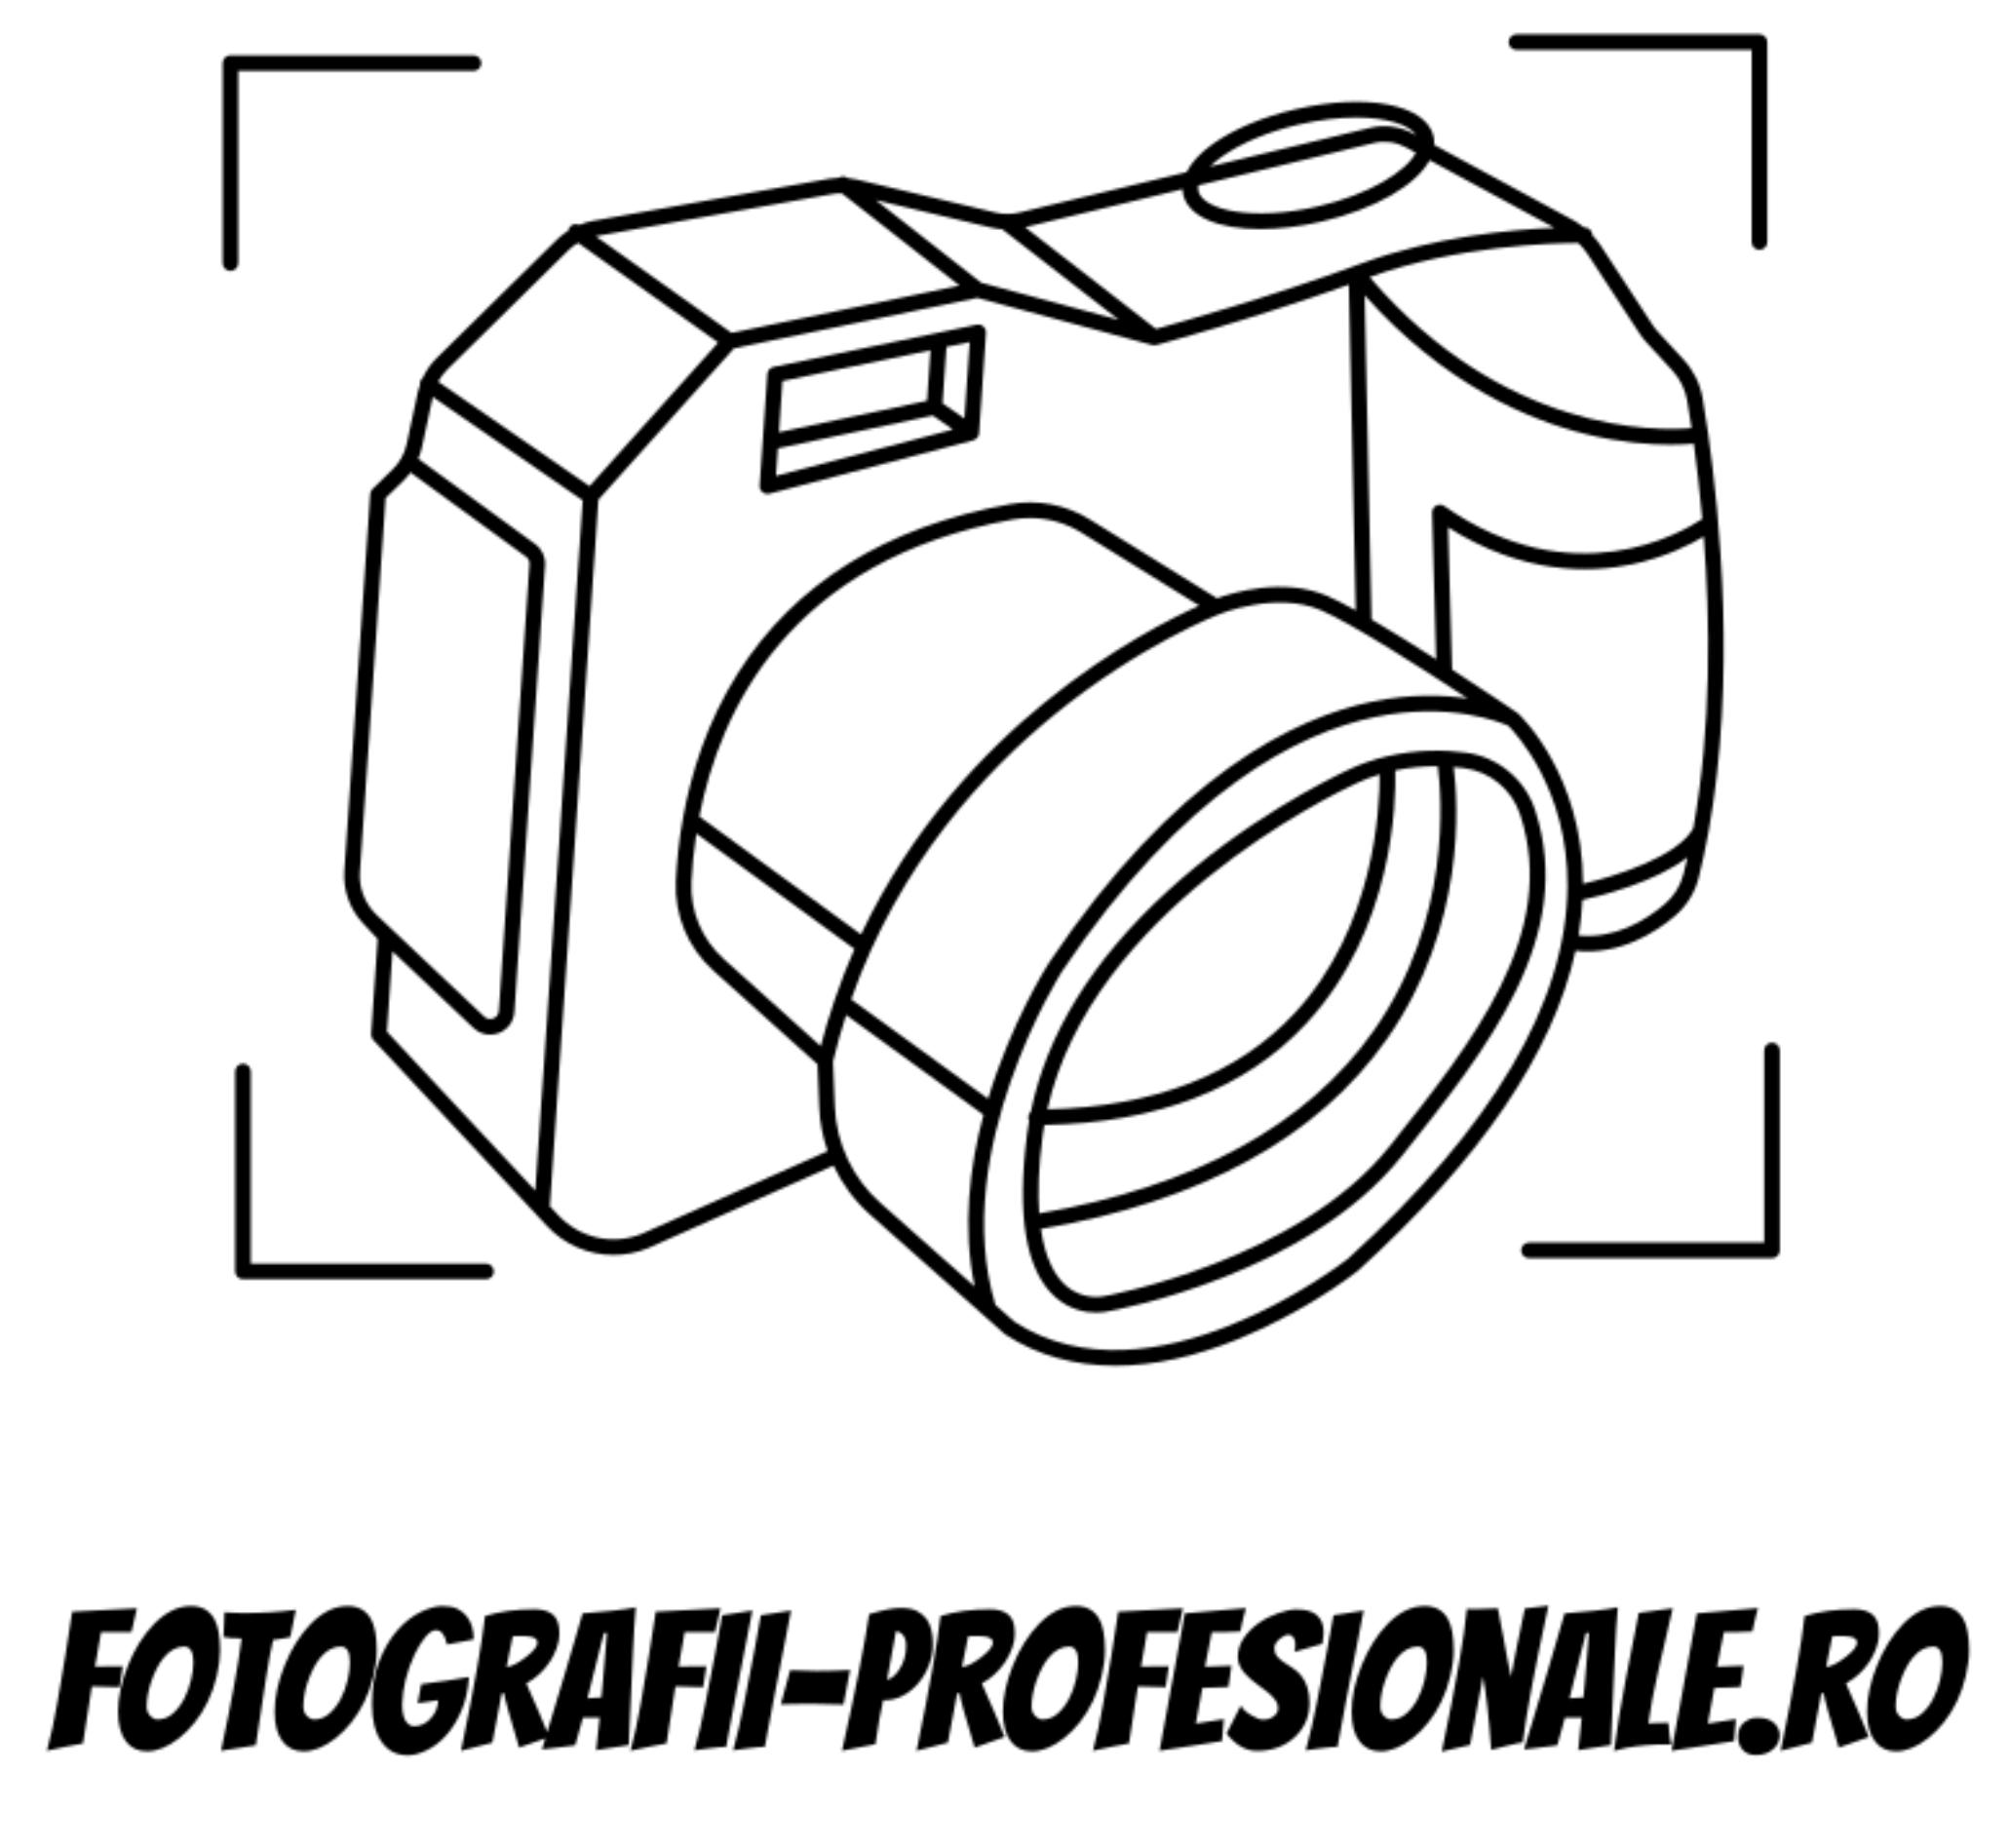 Fotografii profesionale